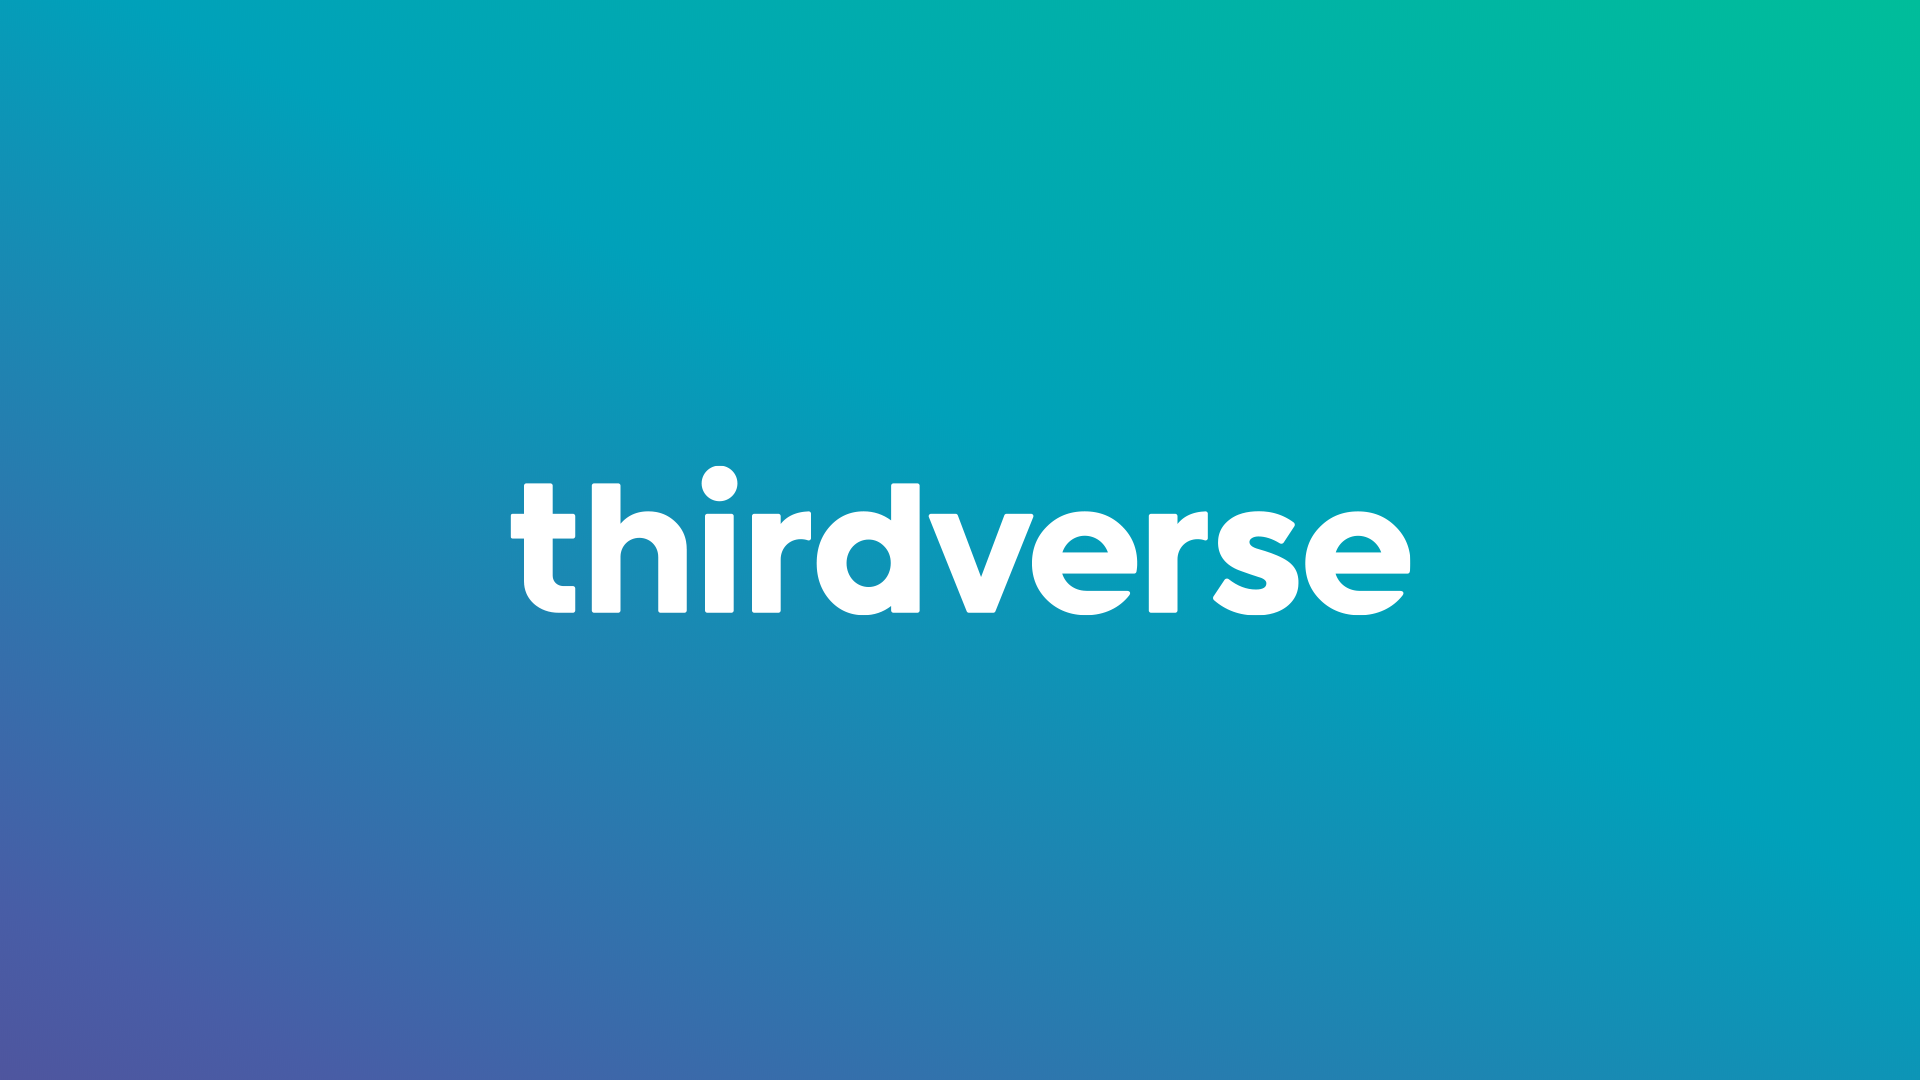 Thirdverse